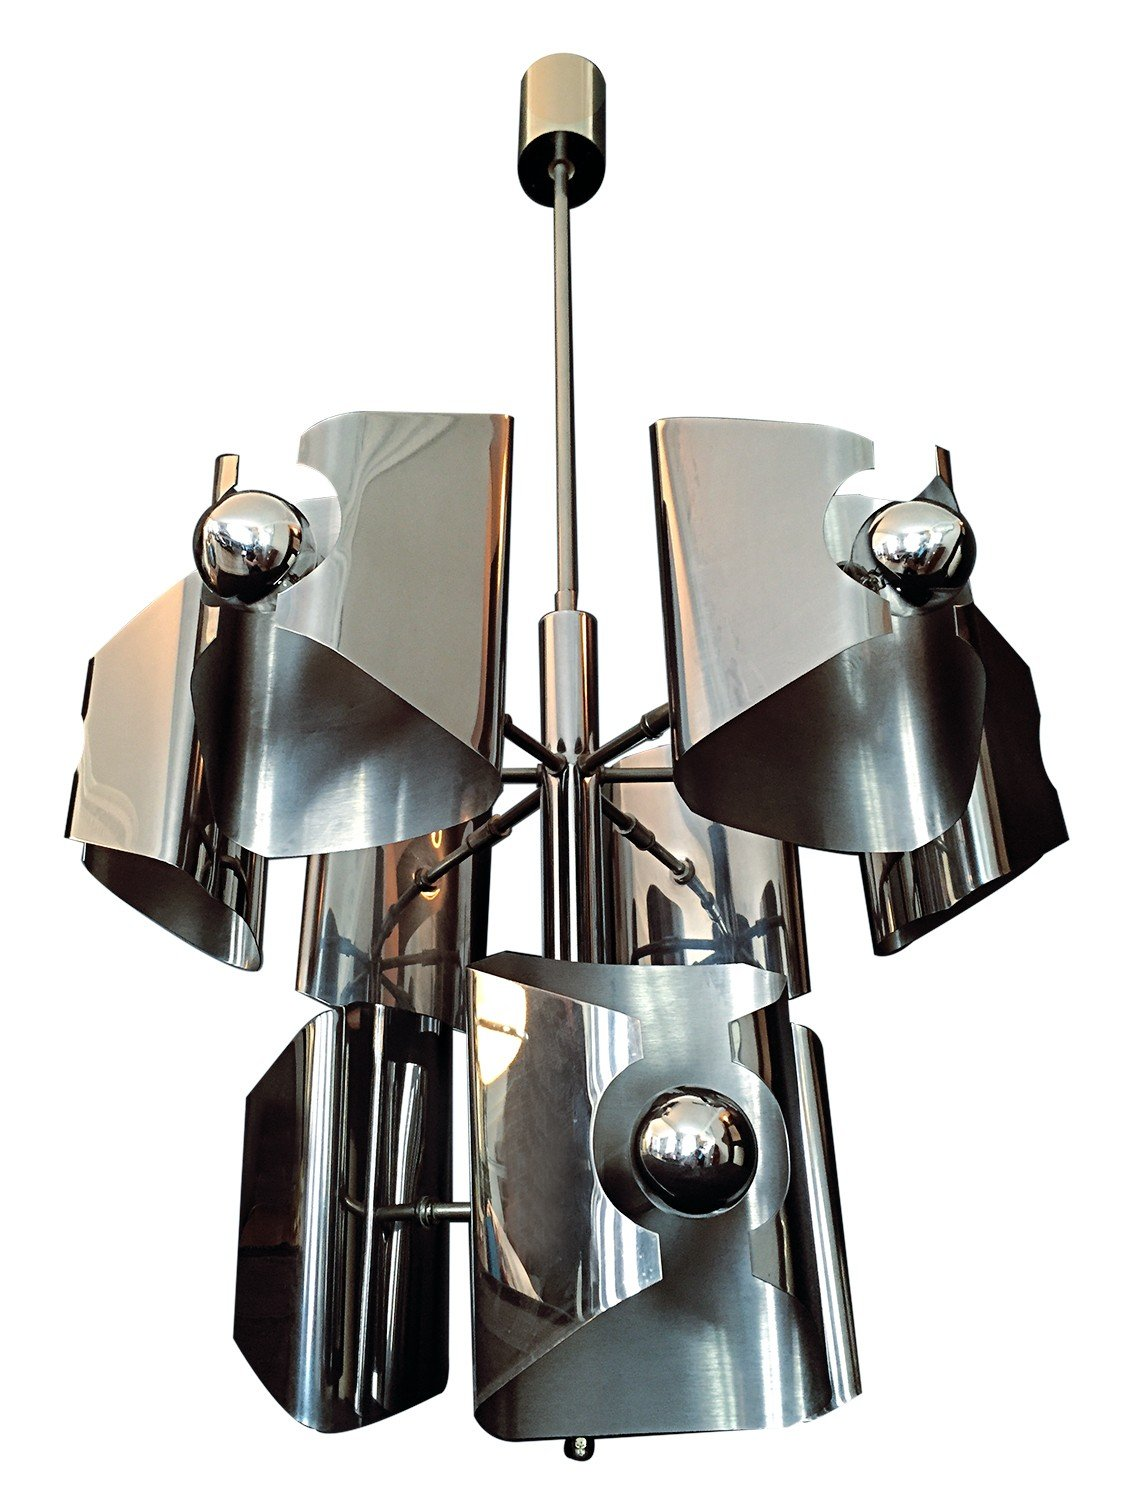 Vintage stainless steel chandelier - 1970s - Design Market